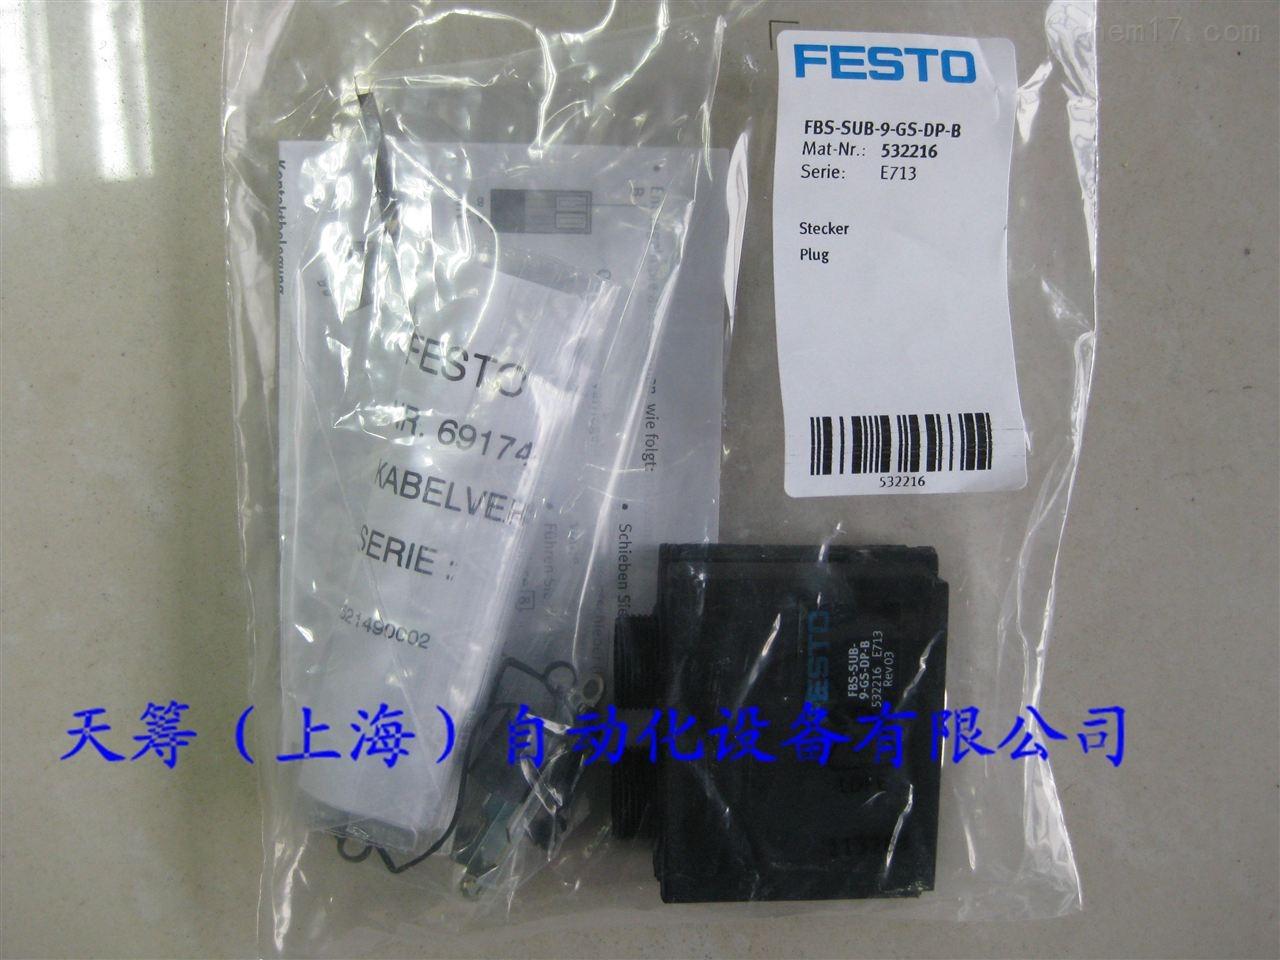 FESTO FBS-SUB-9-GS-DP-B Stecker für Profibus ; 532216 FS